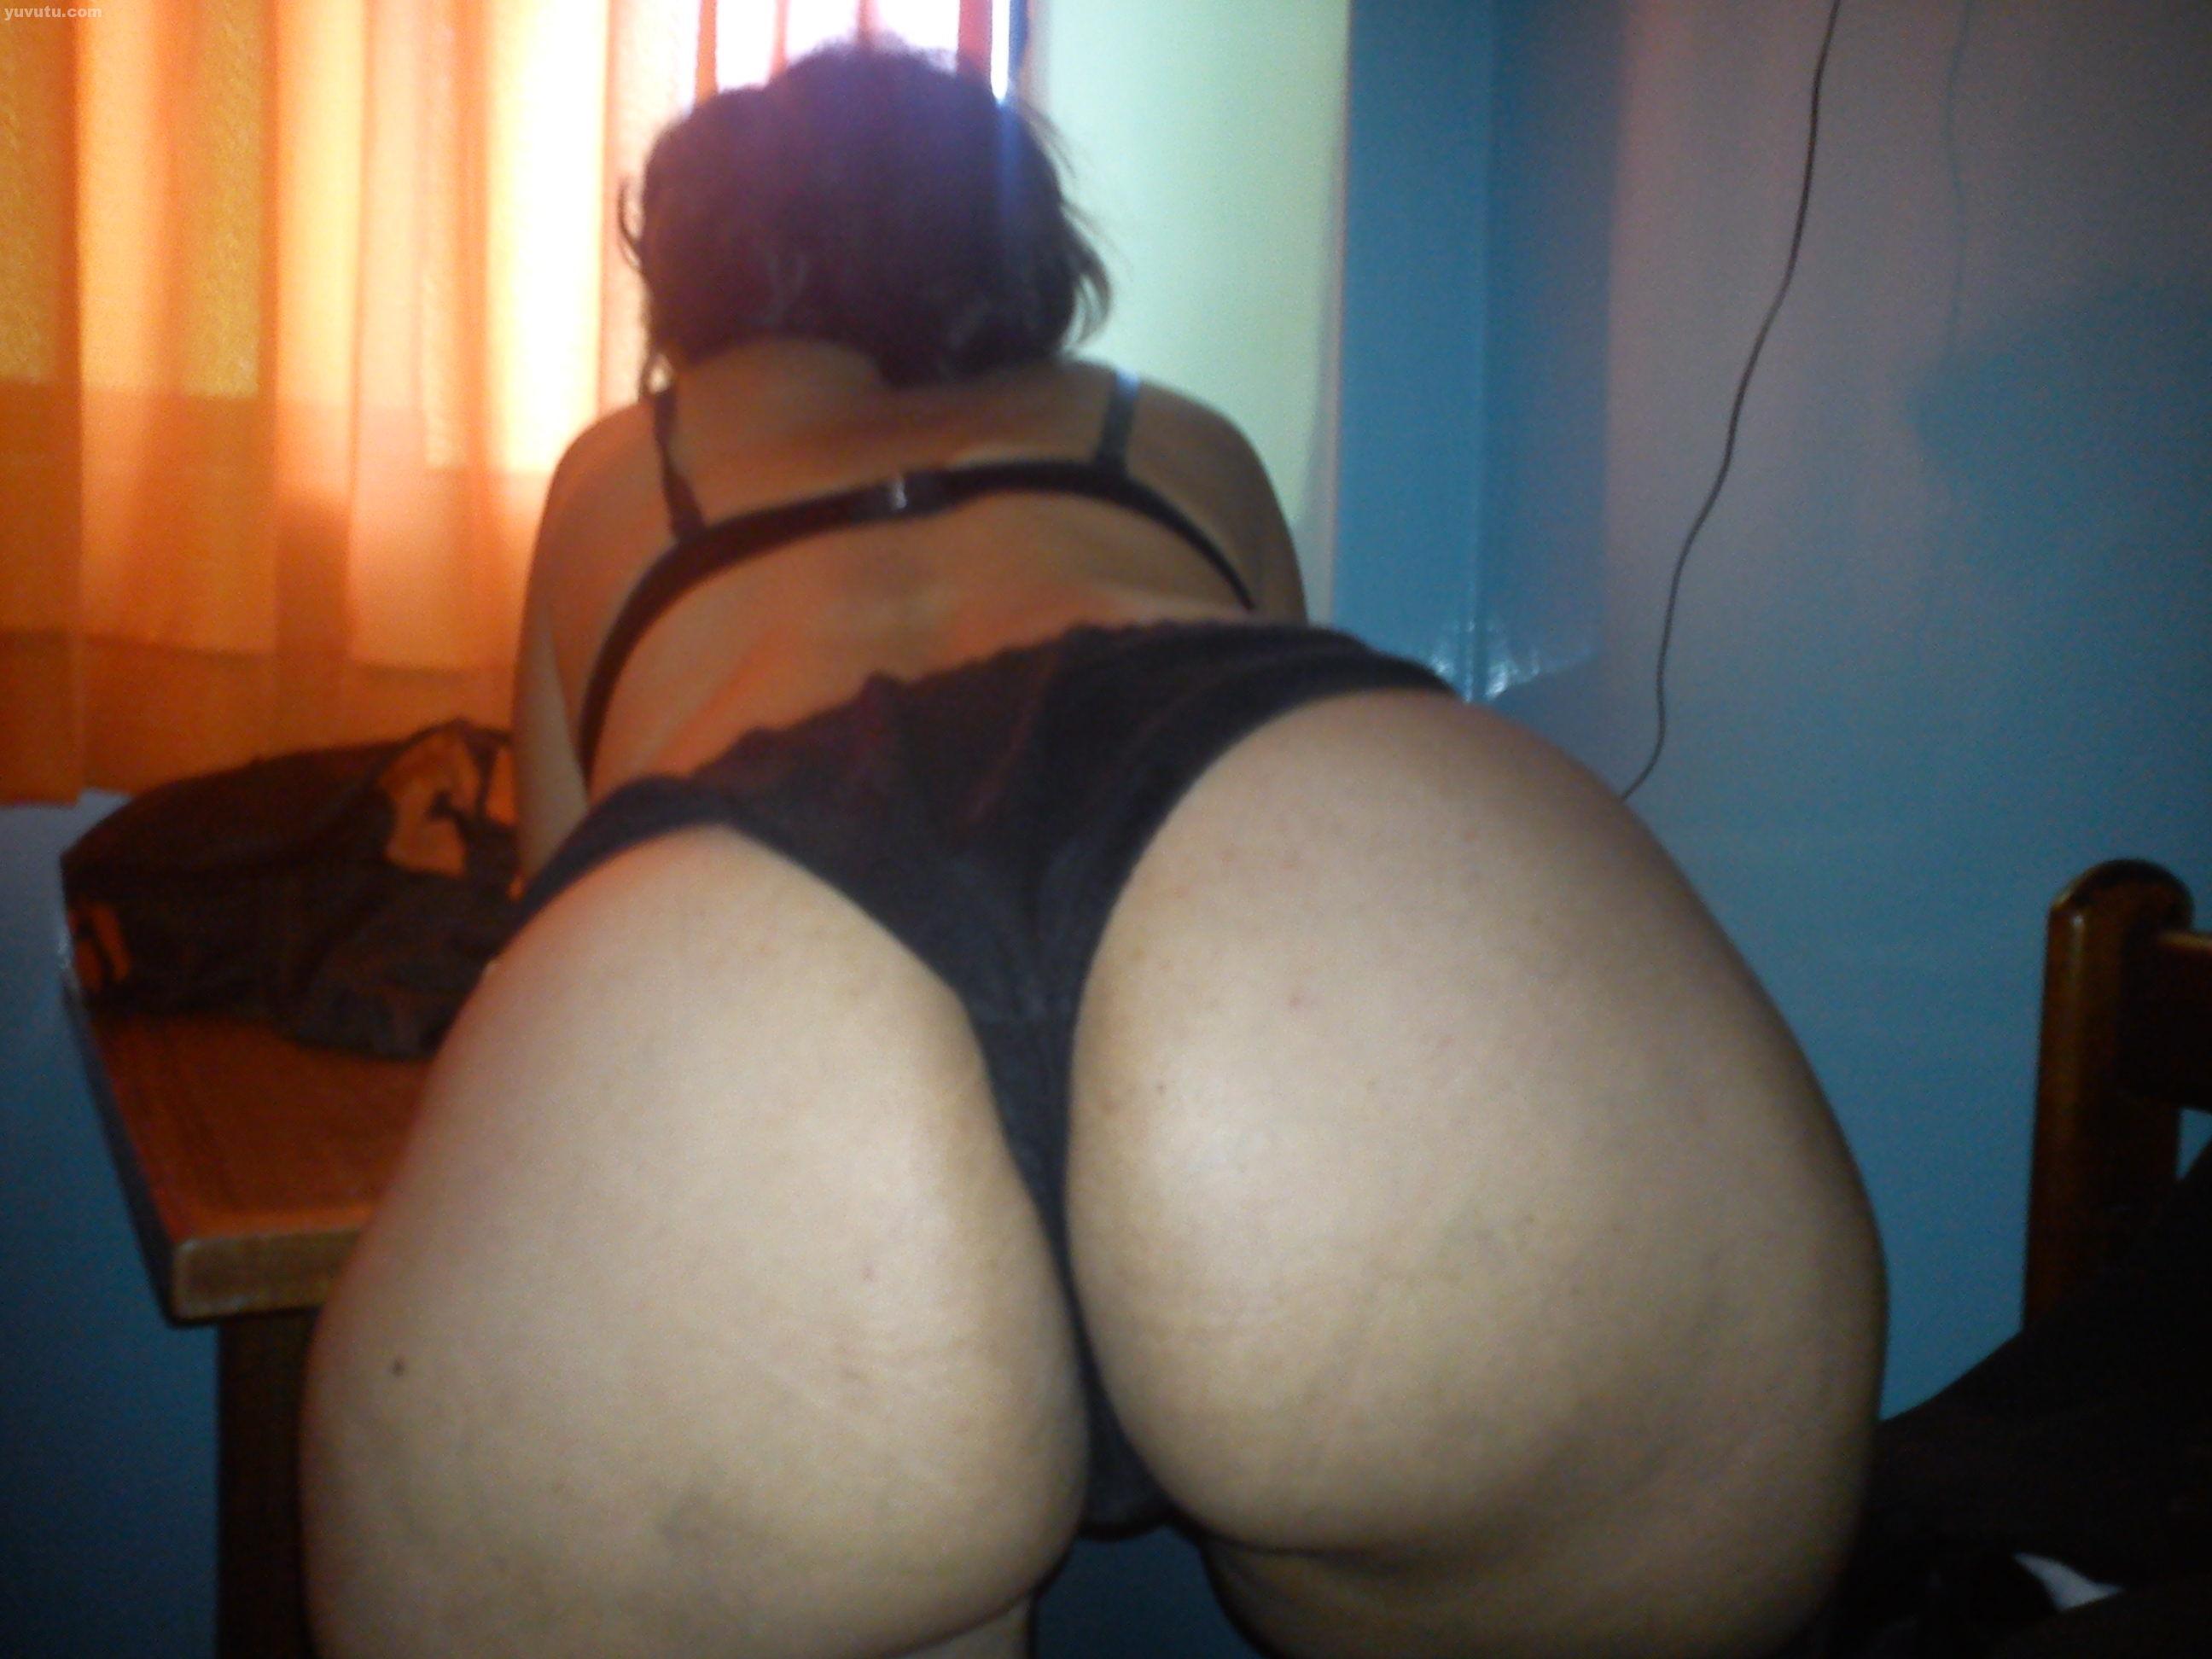 Abuela Nalgona Porno madura culona funny on yuvutu homemade amateur porn movies